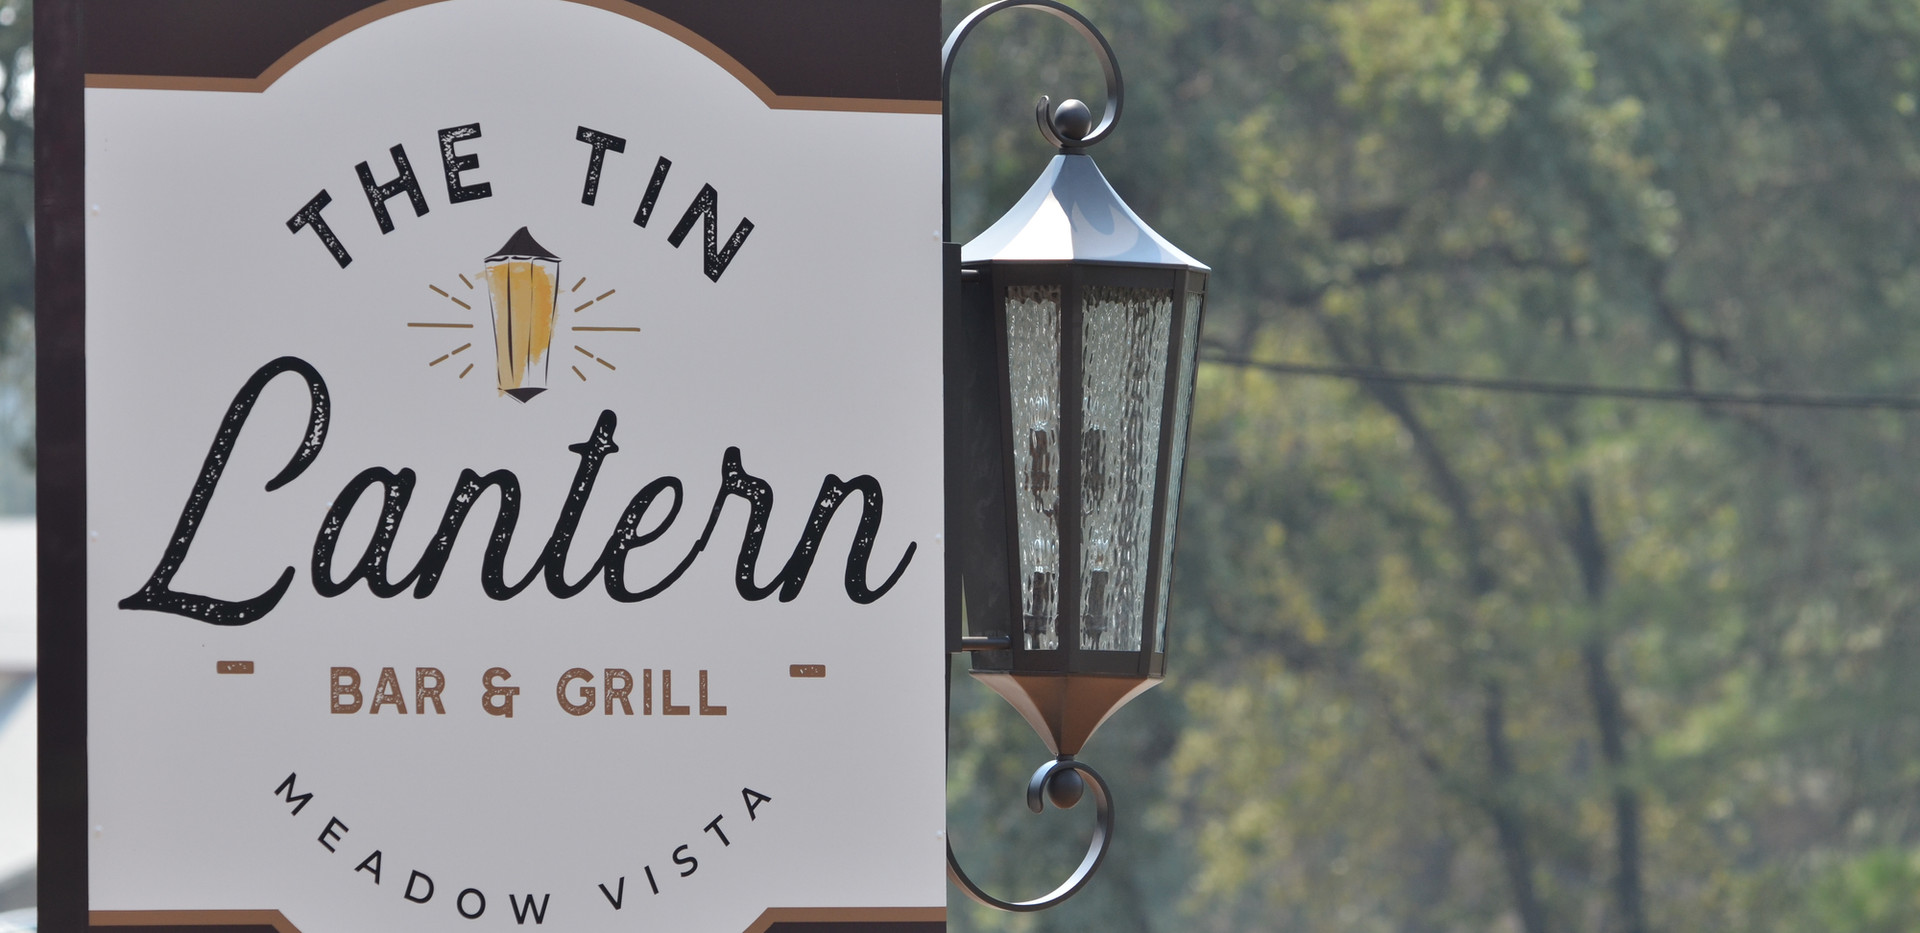 The Tin Lantern Bar & Grill. Sarah Nolivo. Marcello Nolivo. Club Car. Meadow Vista, CA.